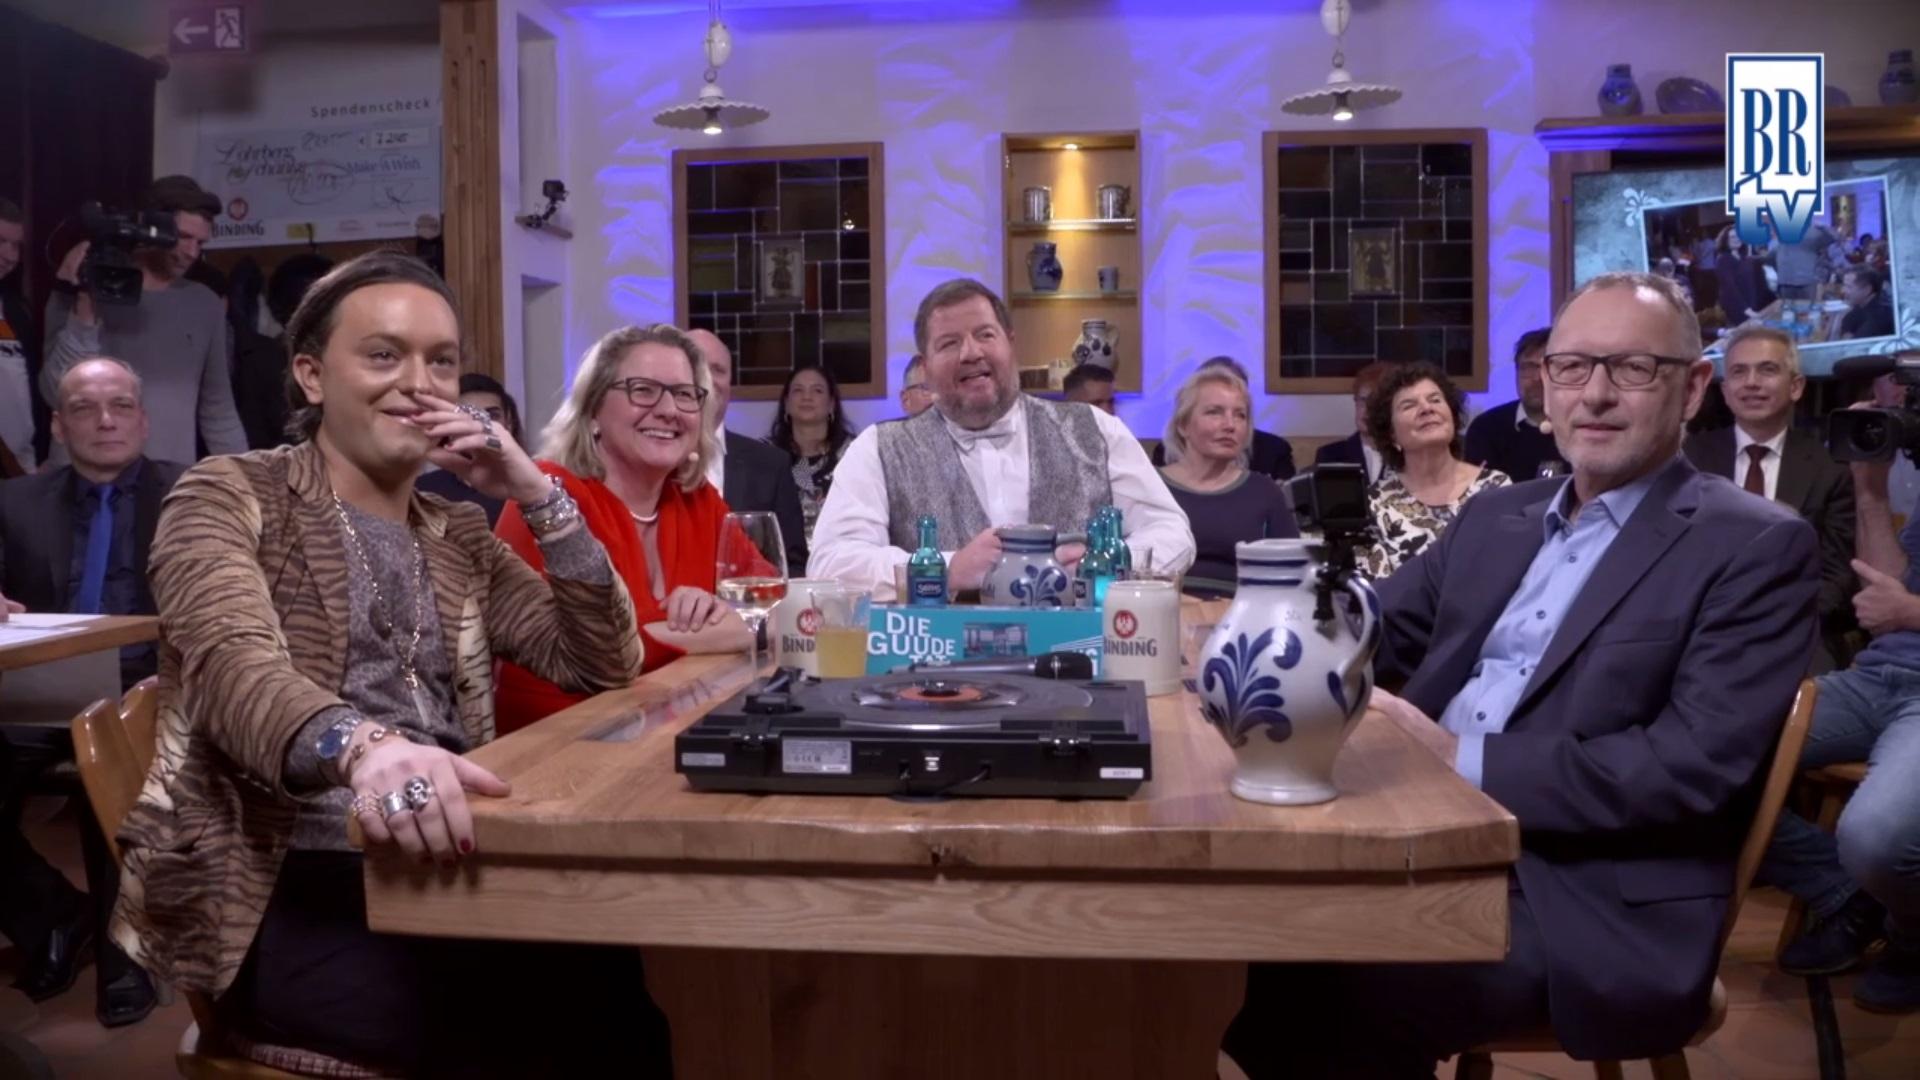 Bembel & Gebabbel – Folge 50 mit Svenja Schulze, Manfred Krupp & Julian F.M. Stoeckelb